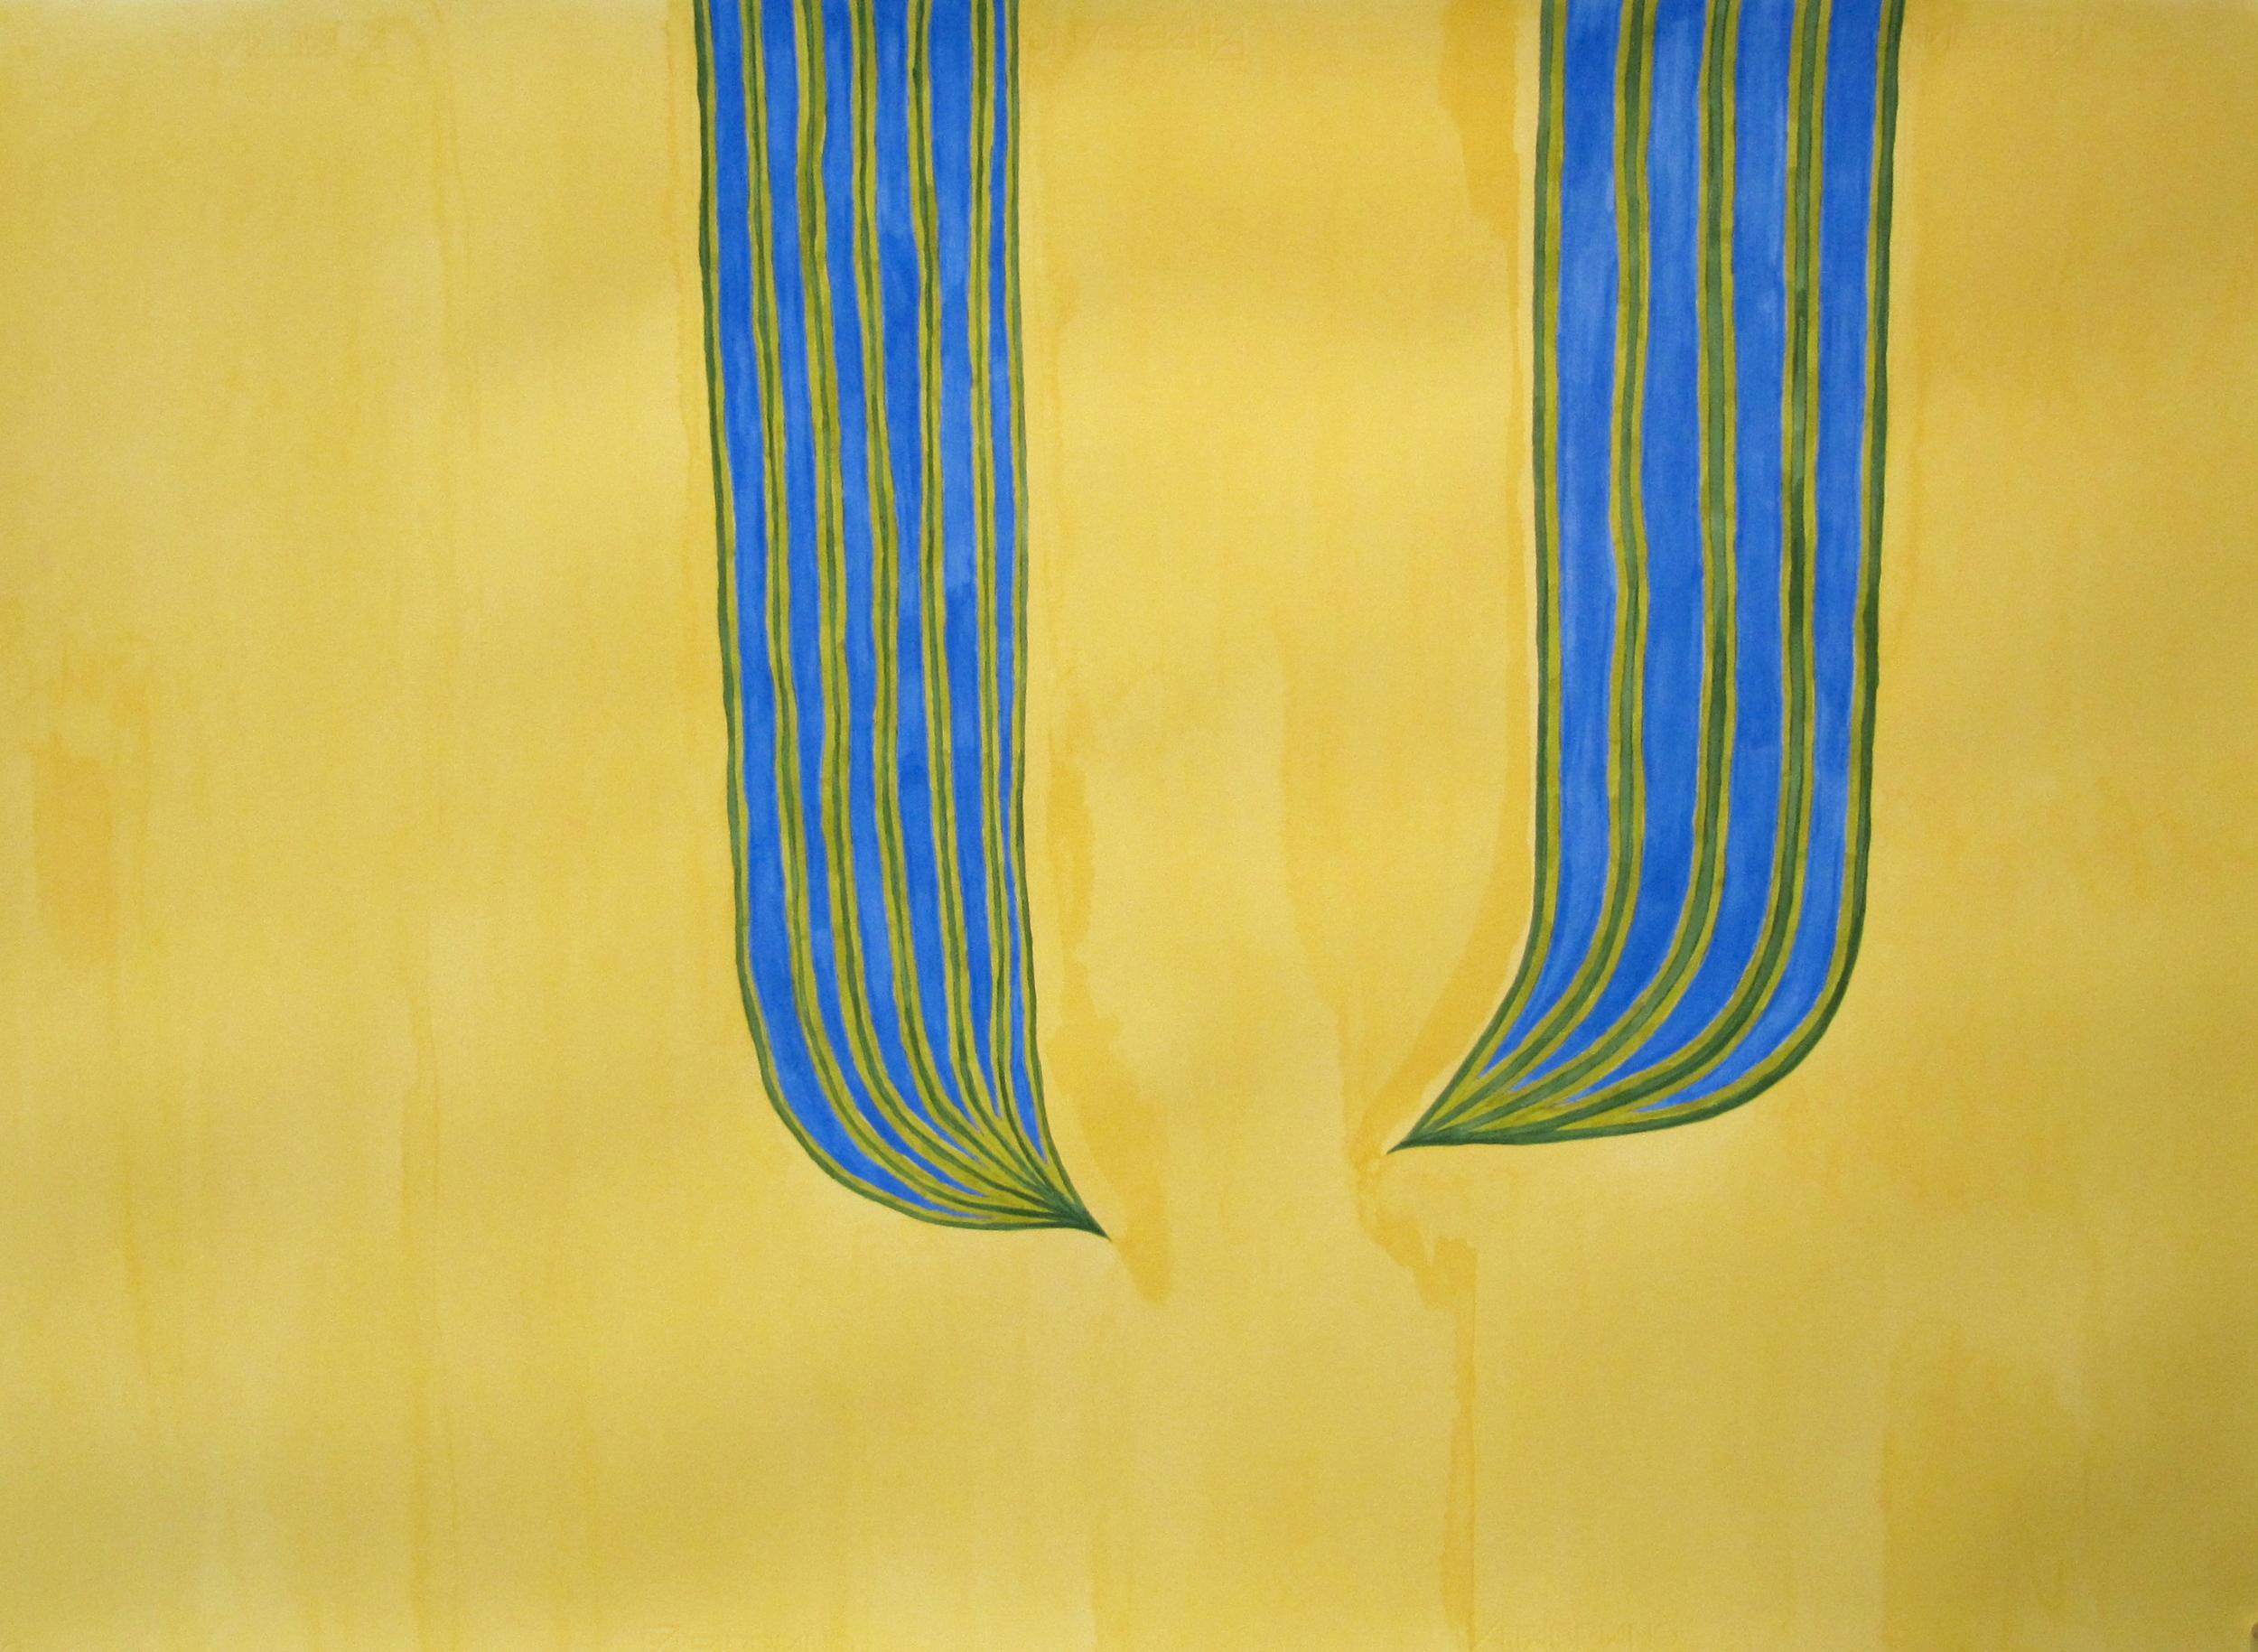 'O loimata 'o Apaula i papa uta | Apaula's tears up high, Léuli Eshraghi, acrylic on Fabriano paper 100 x 71cm, 2012